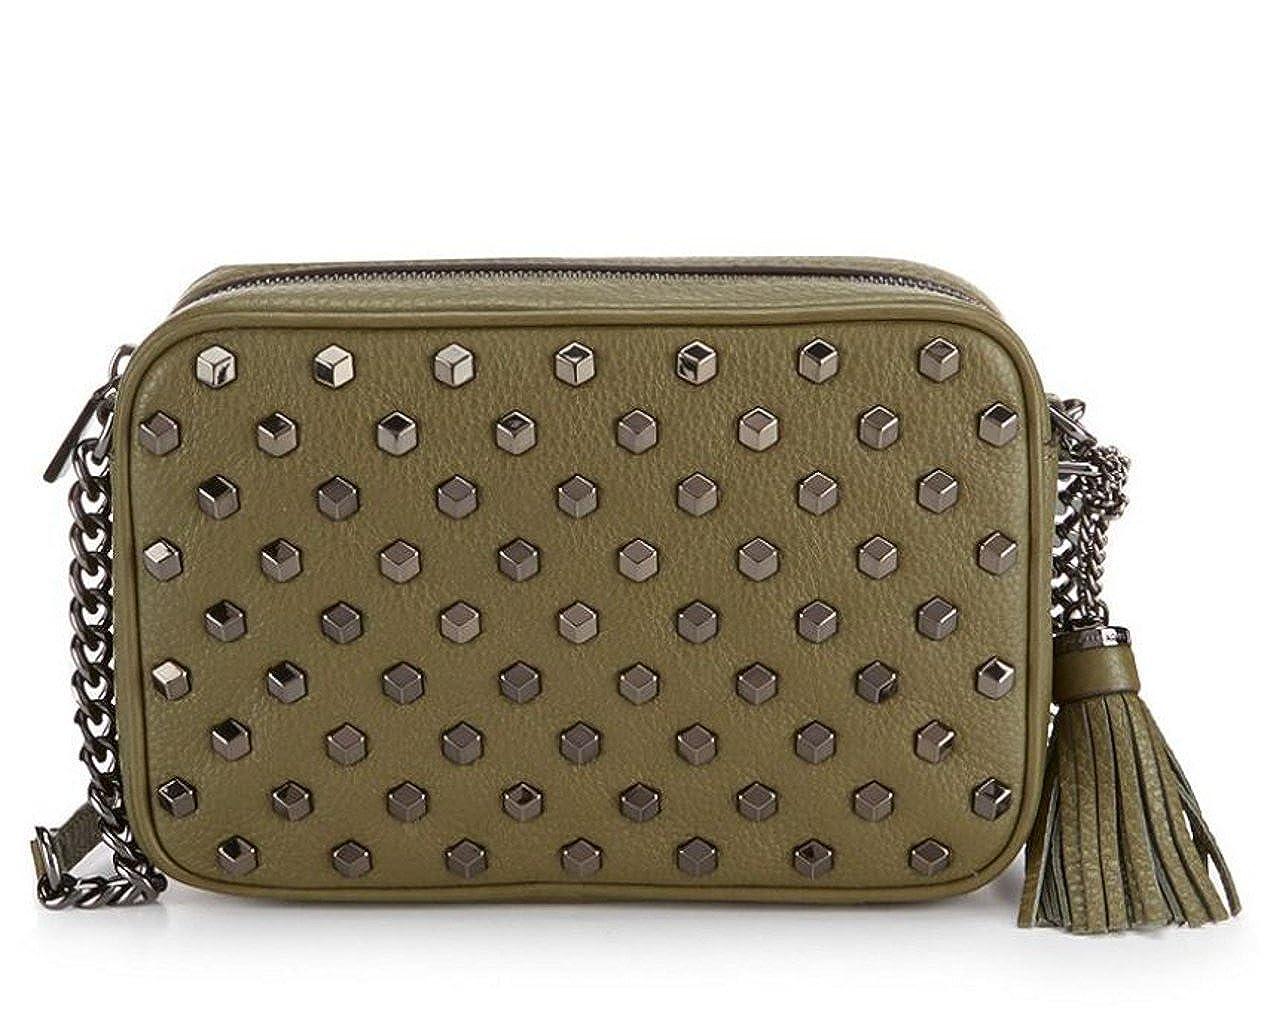 ae9e0d2ca15f MICHAEL Michael Kors Ginny Tasseled Studded Medium Cross-Body Bag  Handbags   Amazon.com